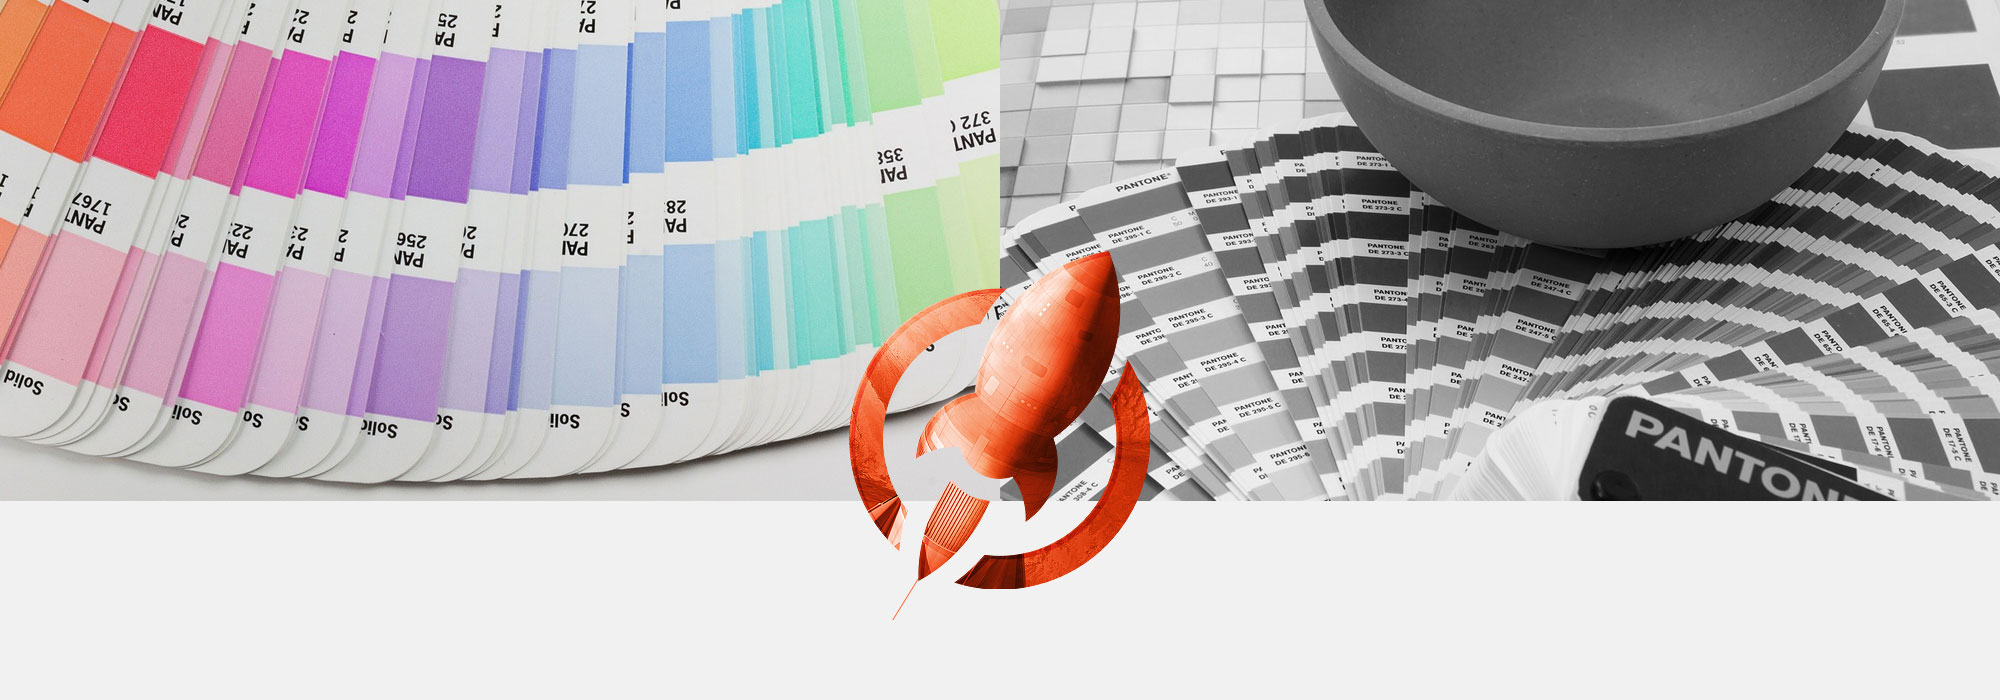 Pantone Matching | Rush Flyer Printing | Same Day Printing